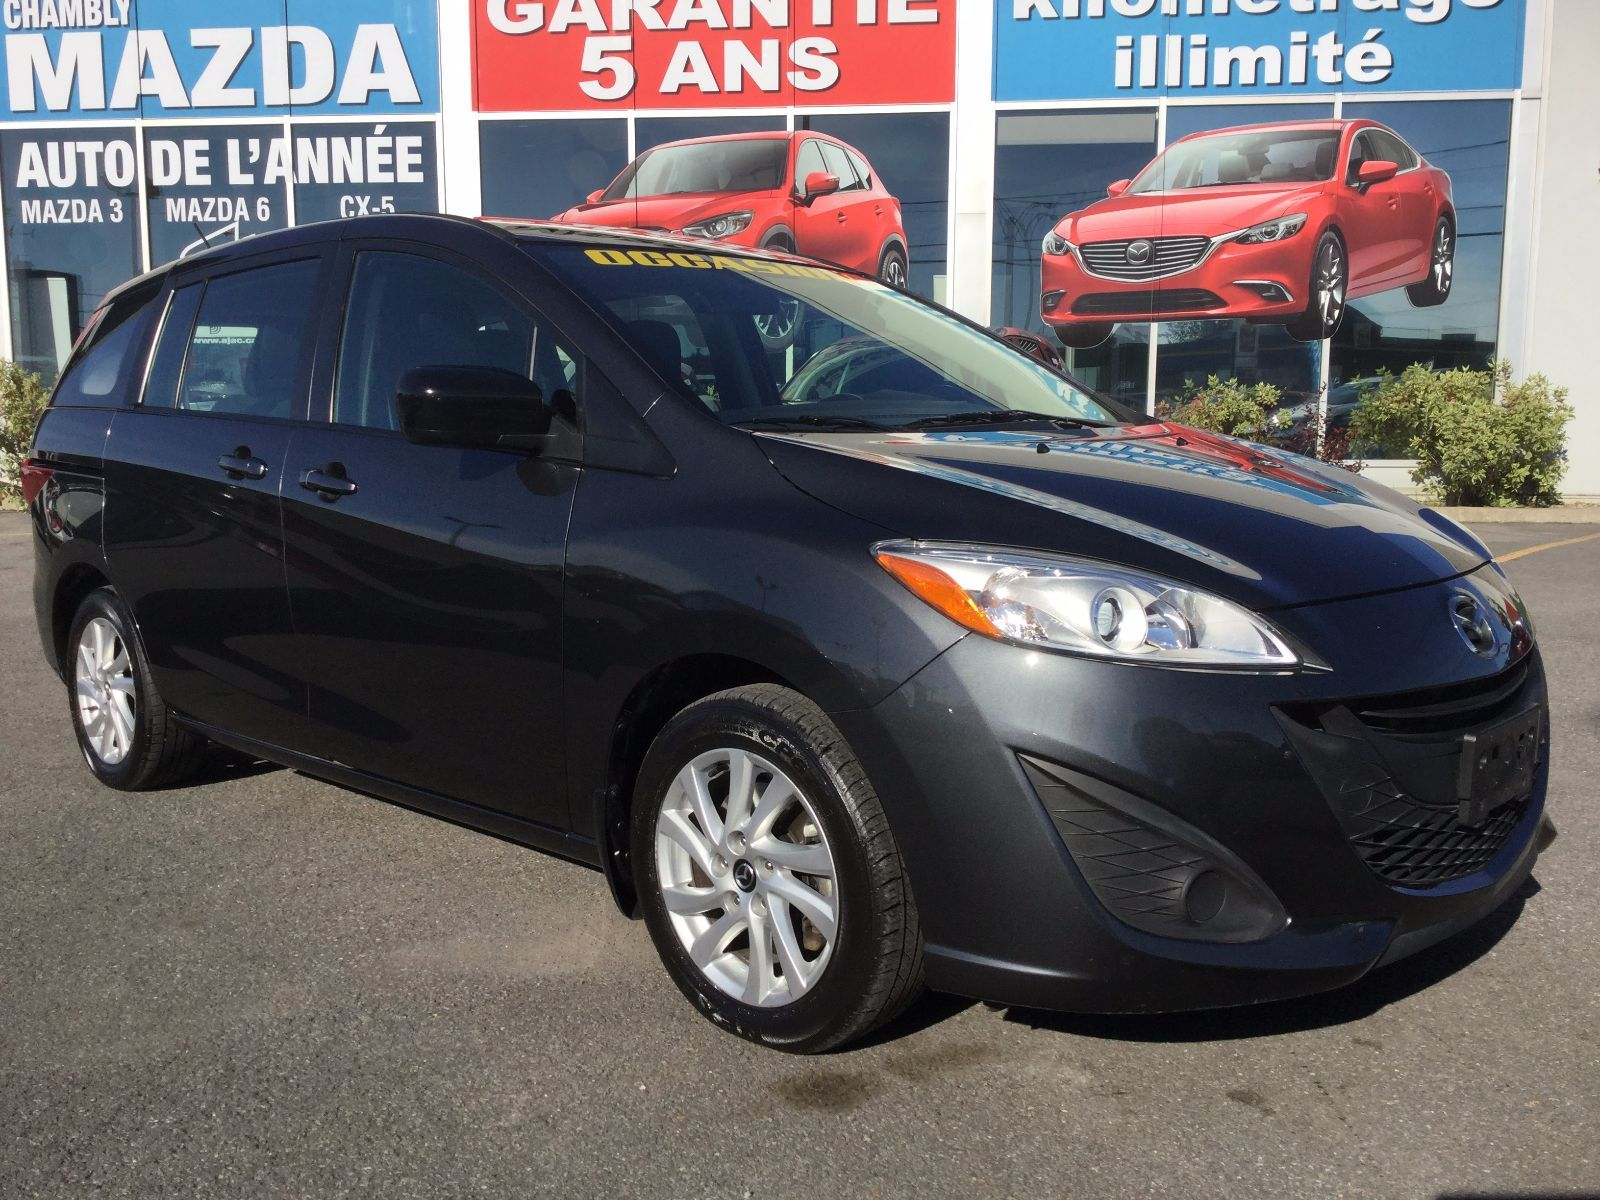 Mazda Mazda5 ***RÉSERVÉ***, GS, BLUETOOTH, MAGS, 2015 JAMAIS ACCIDENTÉ